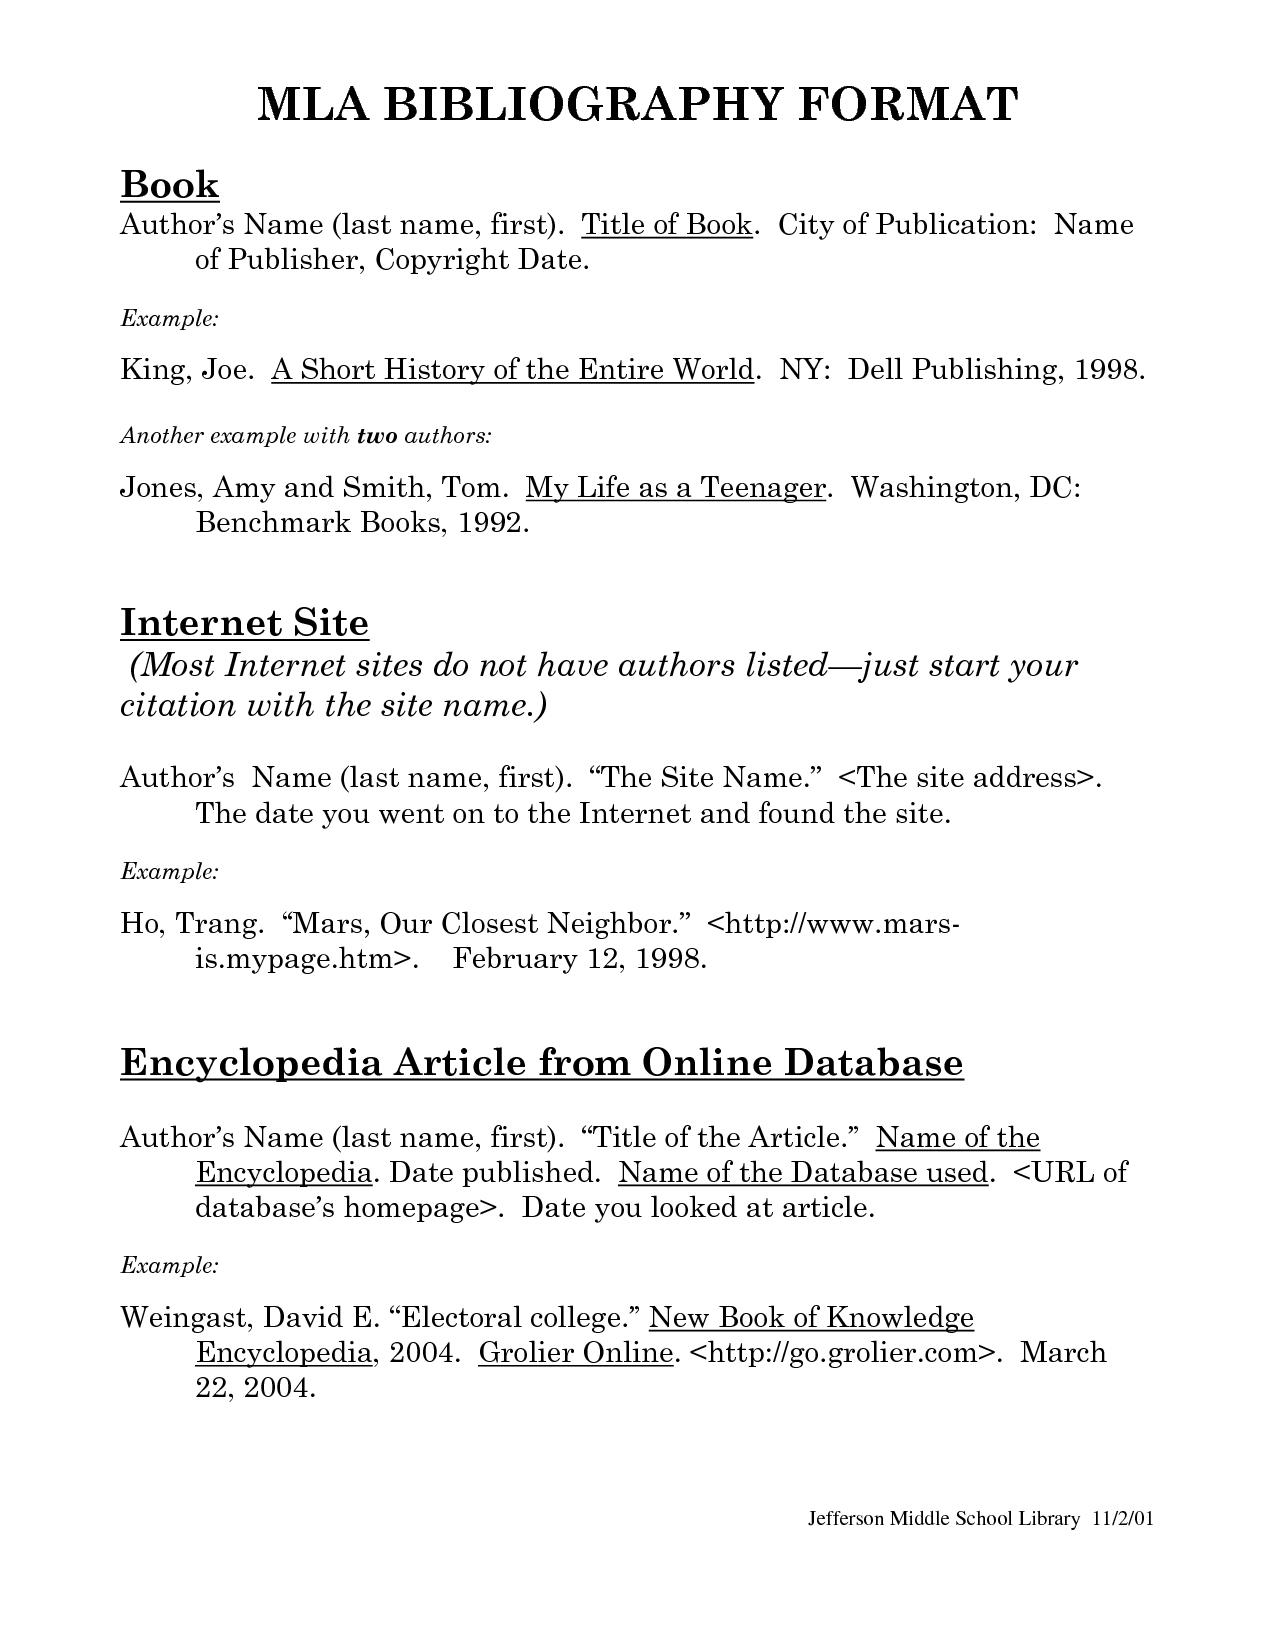 mla format online